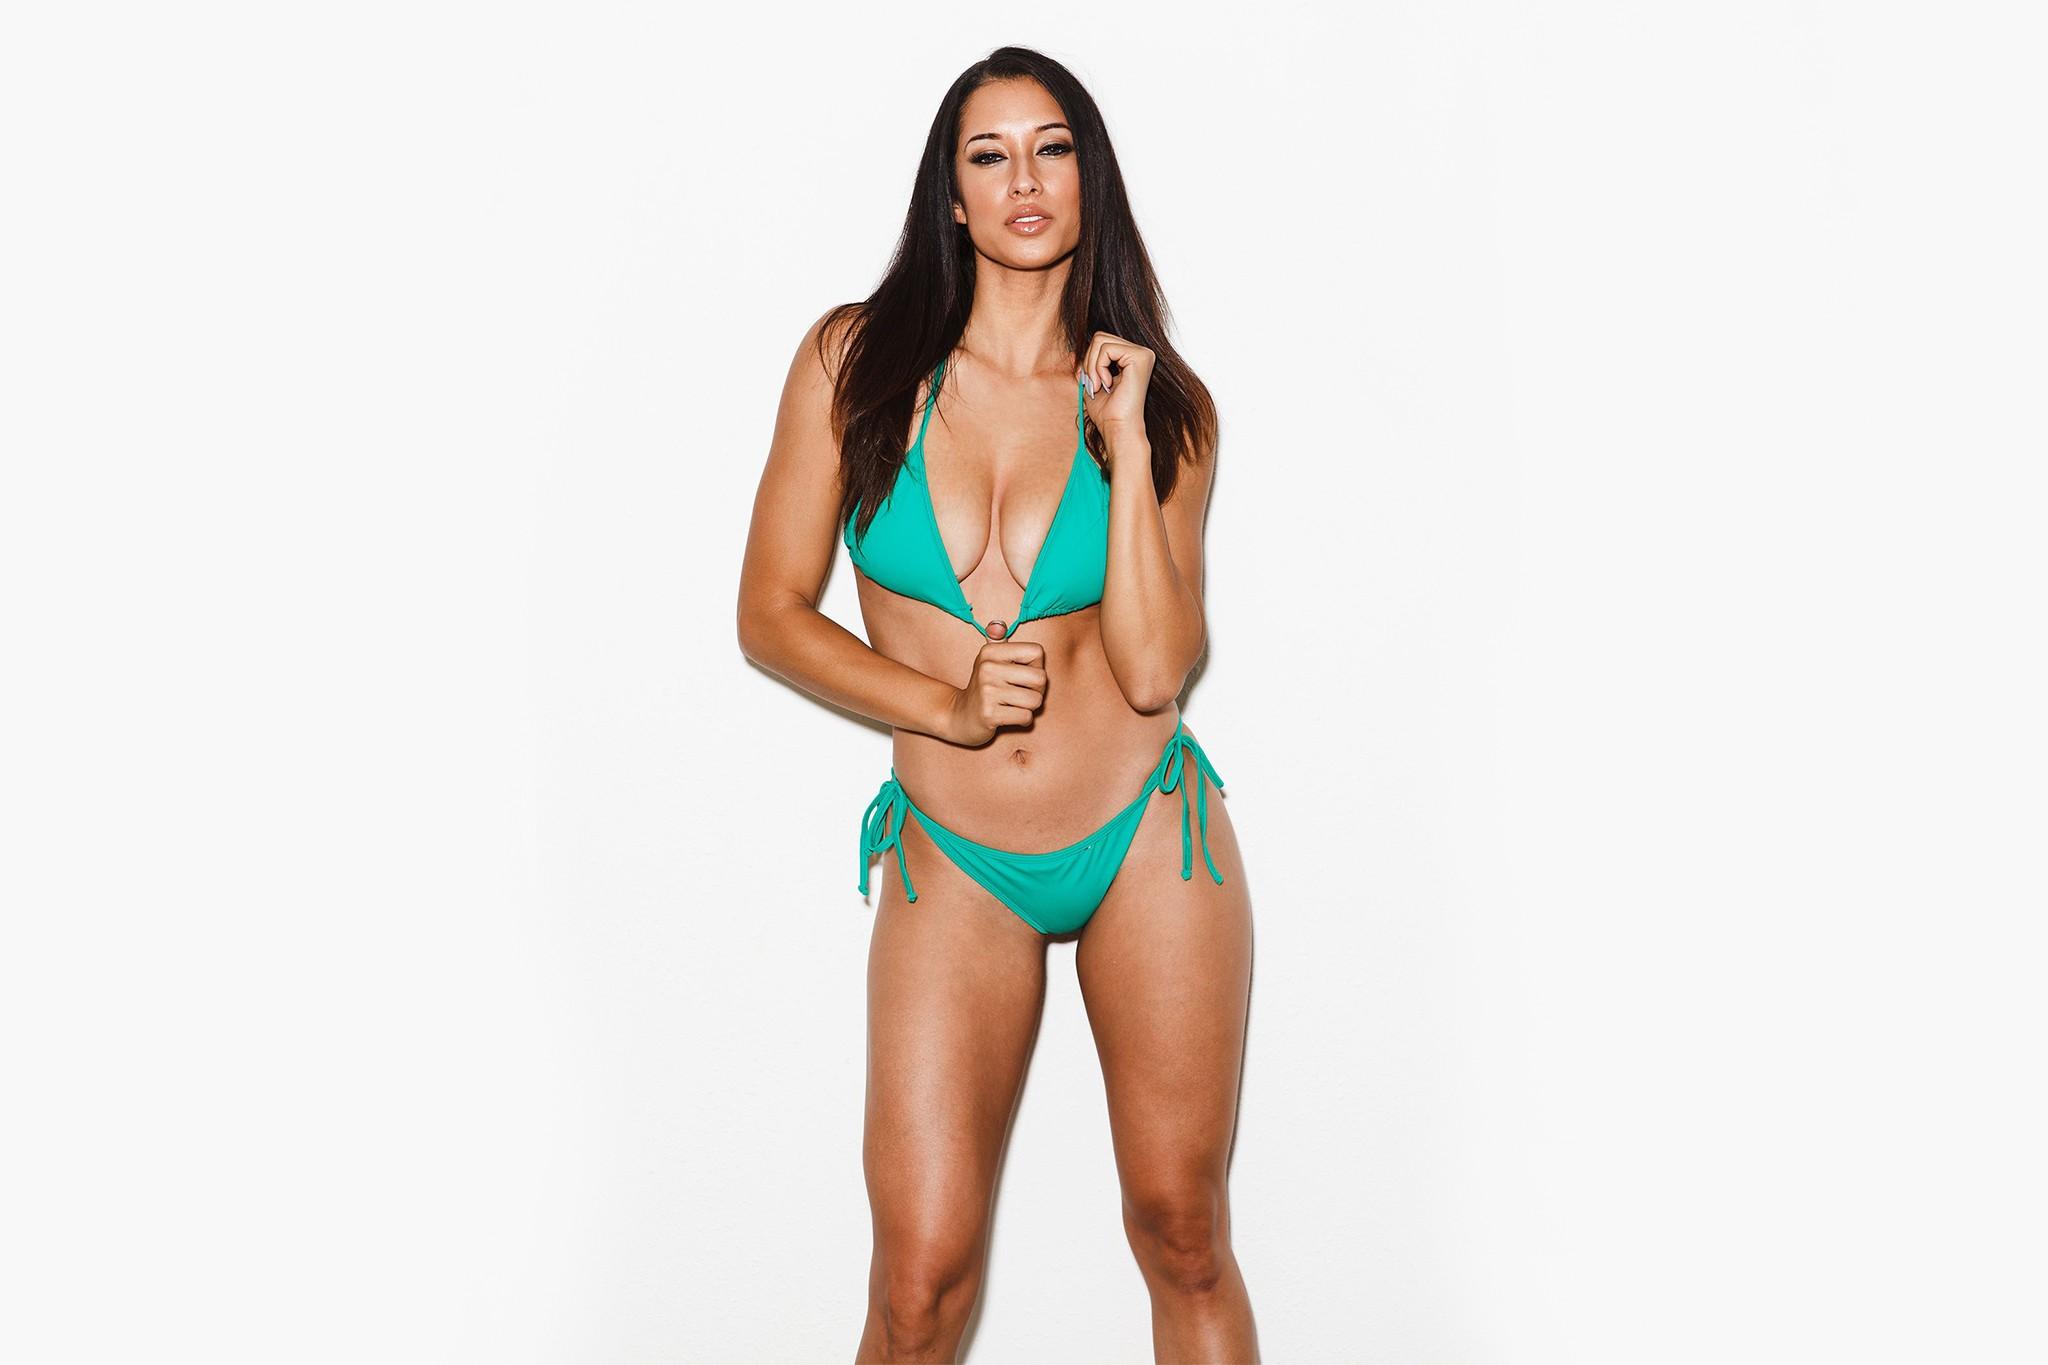 Bikini fitness supermodel